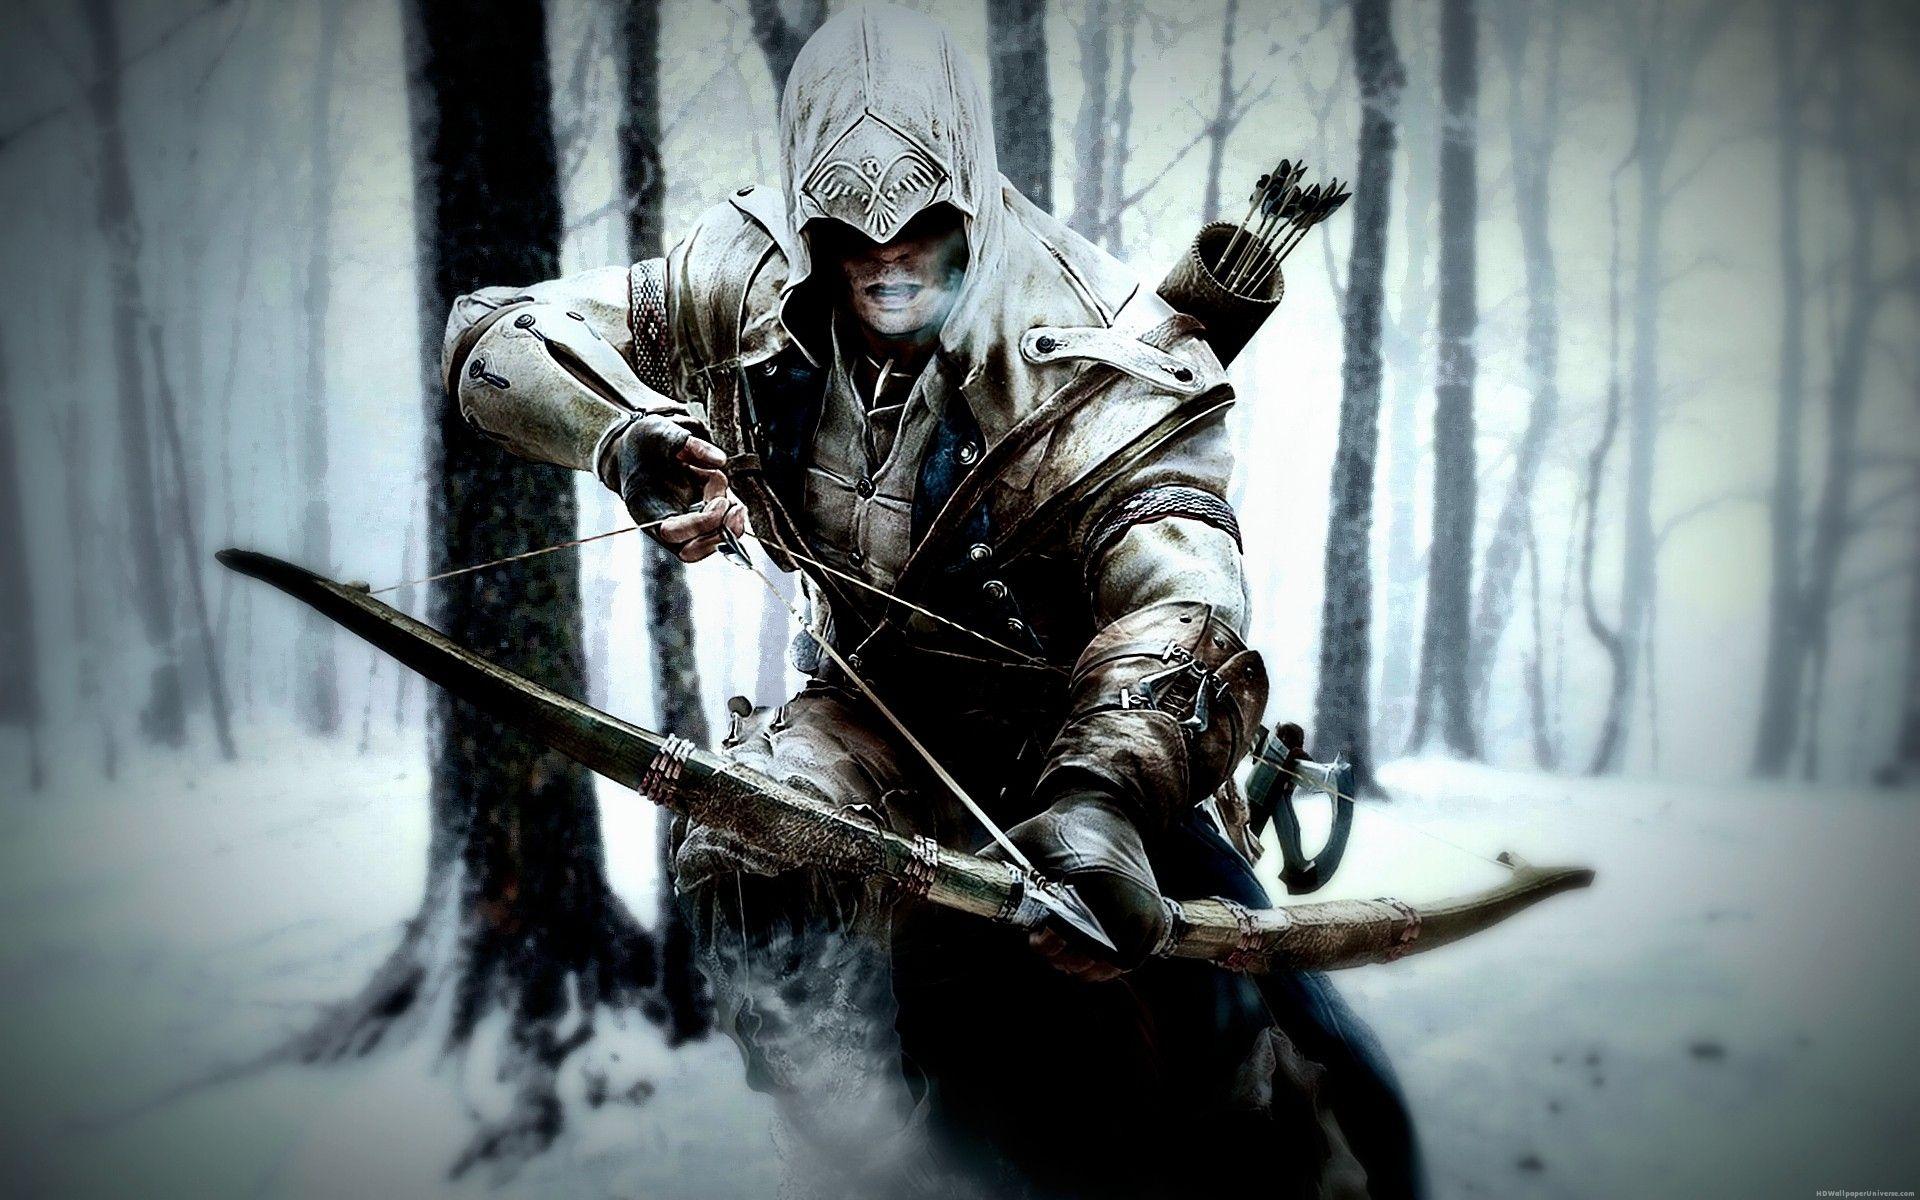 Assassins creed 3 winter bowman hd wallpaper httpwww assassins creed 3 winter bowman hd wallpaper httphdwallpaperuniverse voltagebd Choice Image